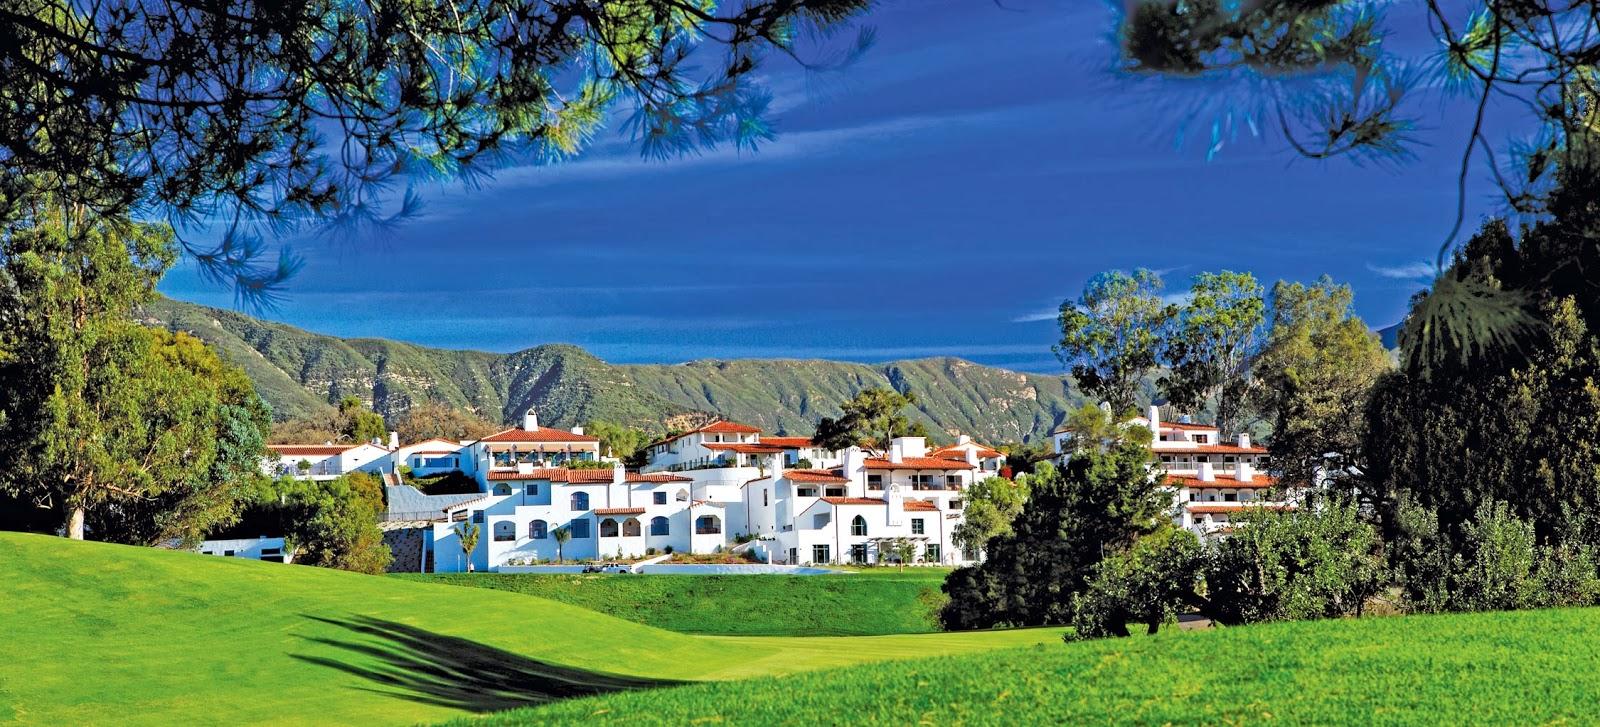 Rooms: Luxury Hotels: Ojai Valley Inn & Spa